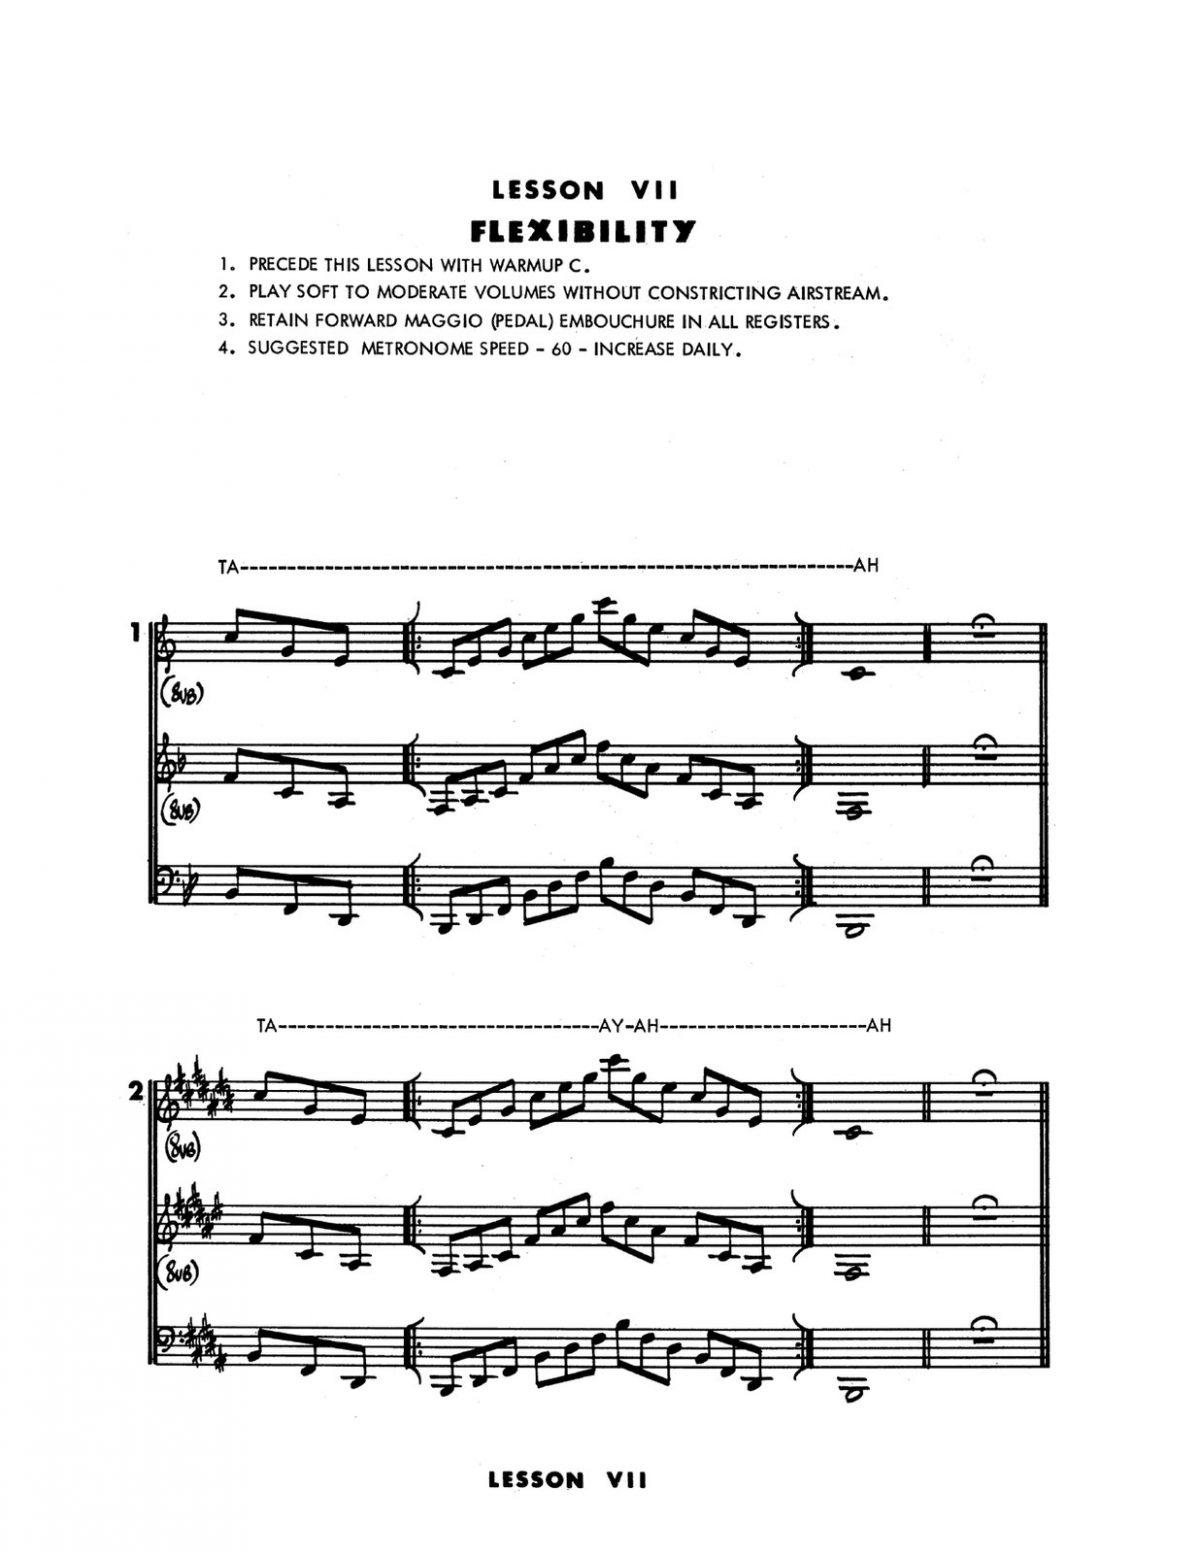 Macbeth, The Original Louis Maggio System for Brass-p097